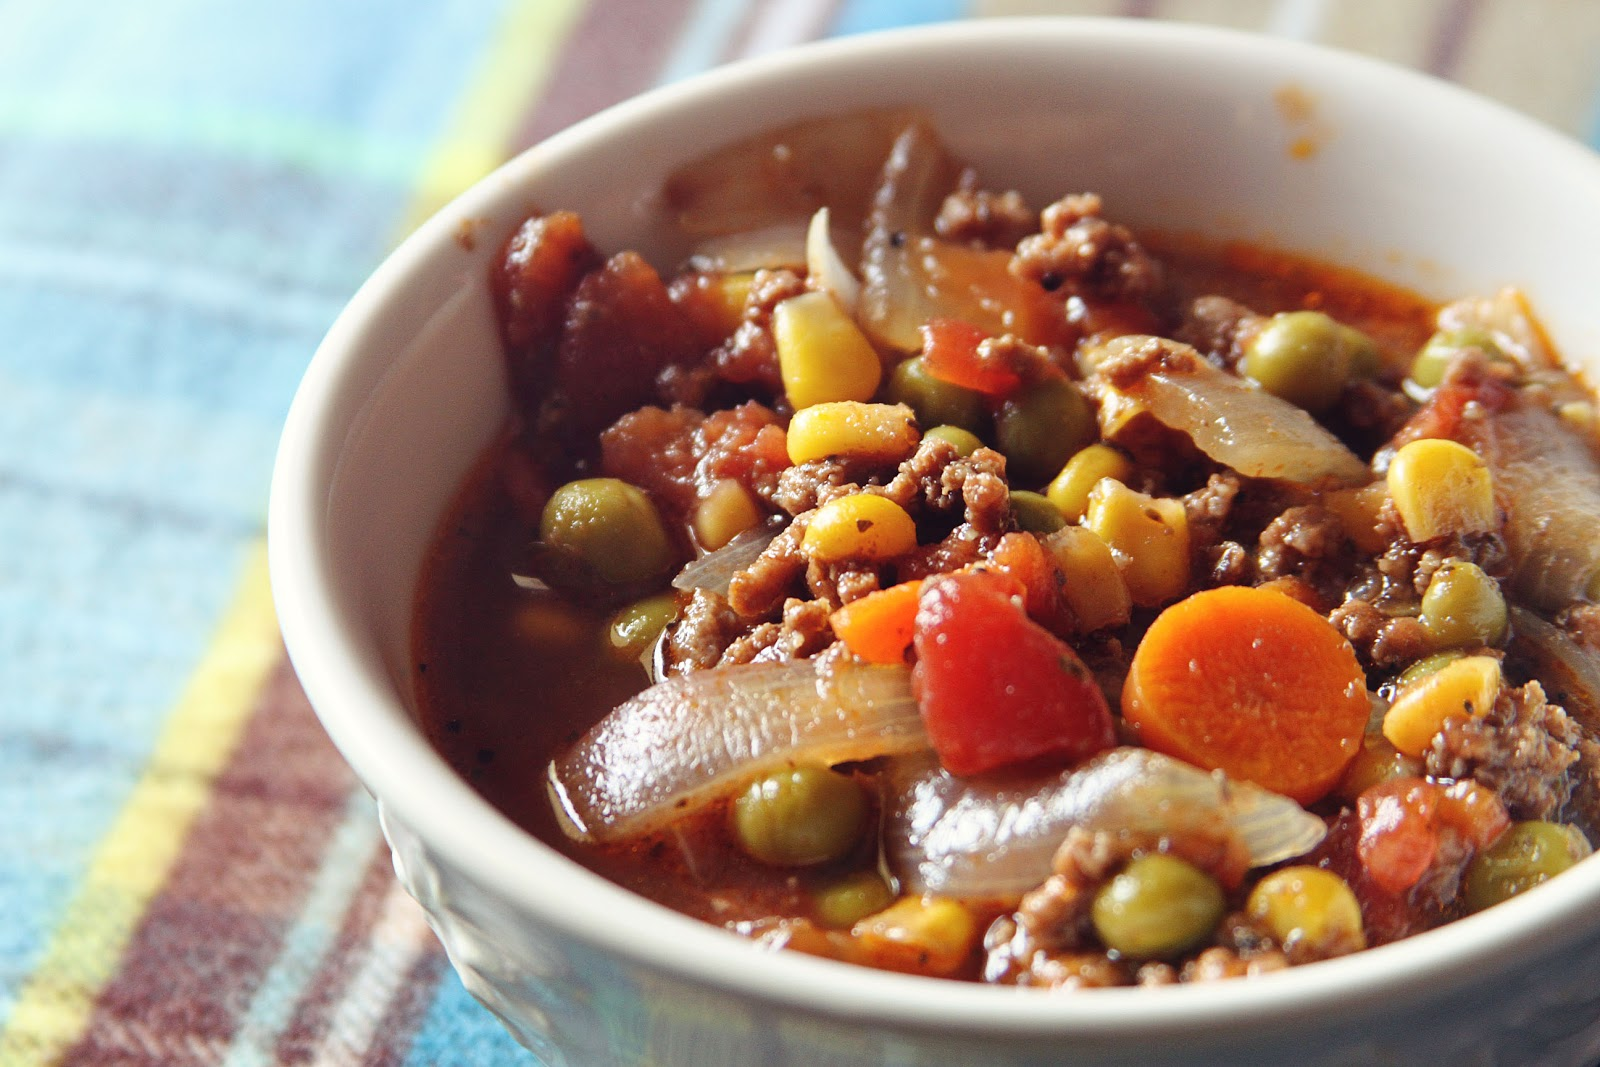 Hayseed Homemakin': My Autumn Vegetable Beef Soup